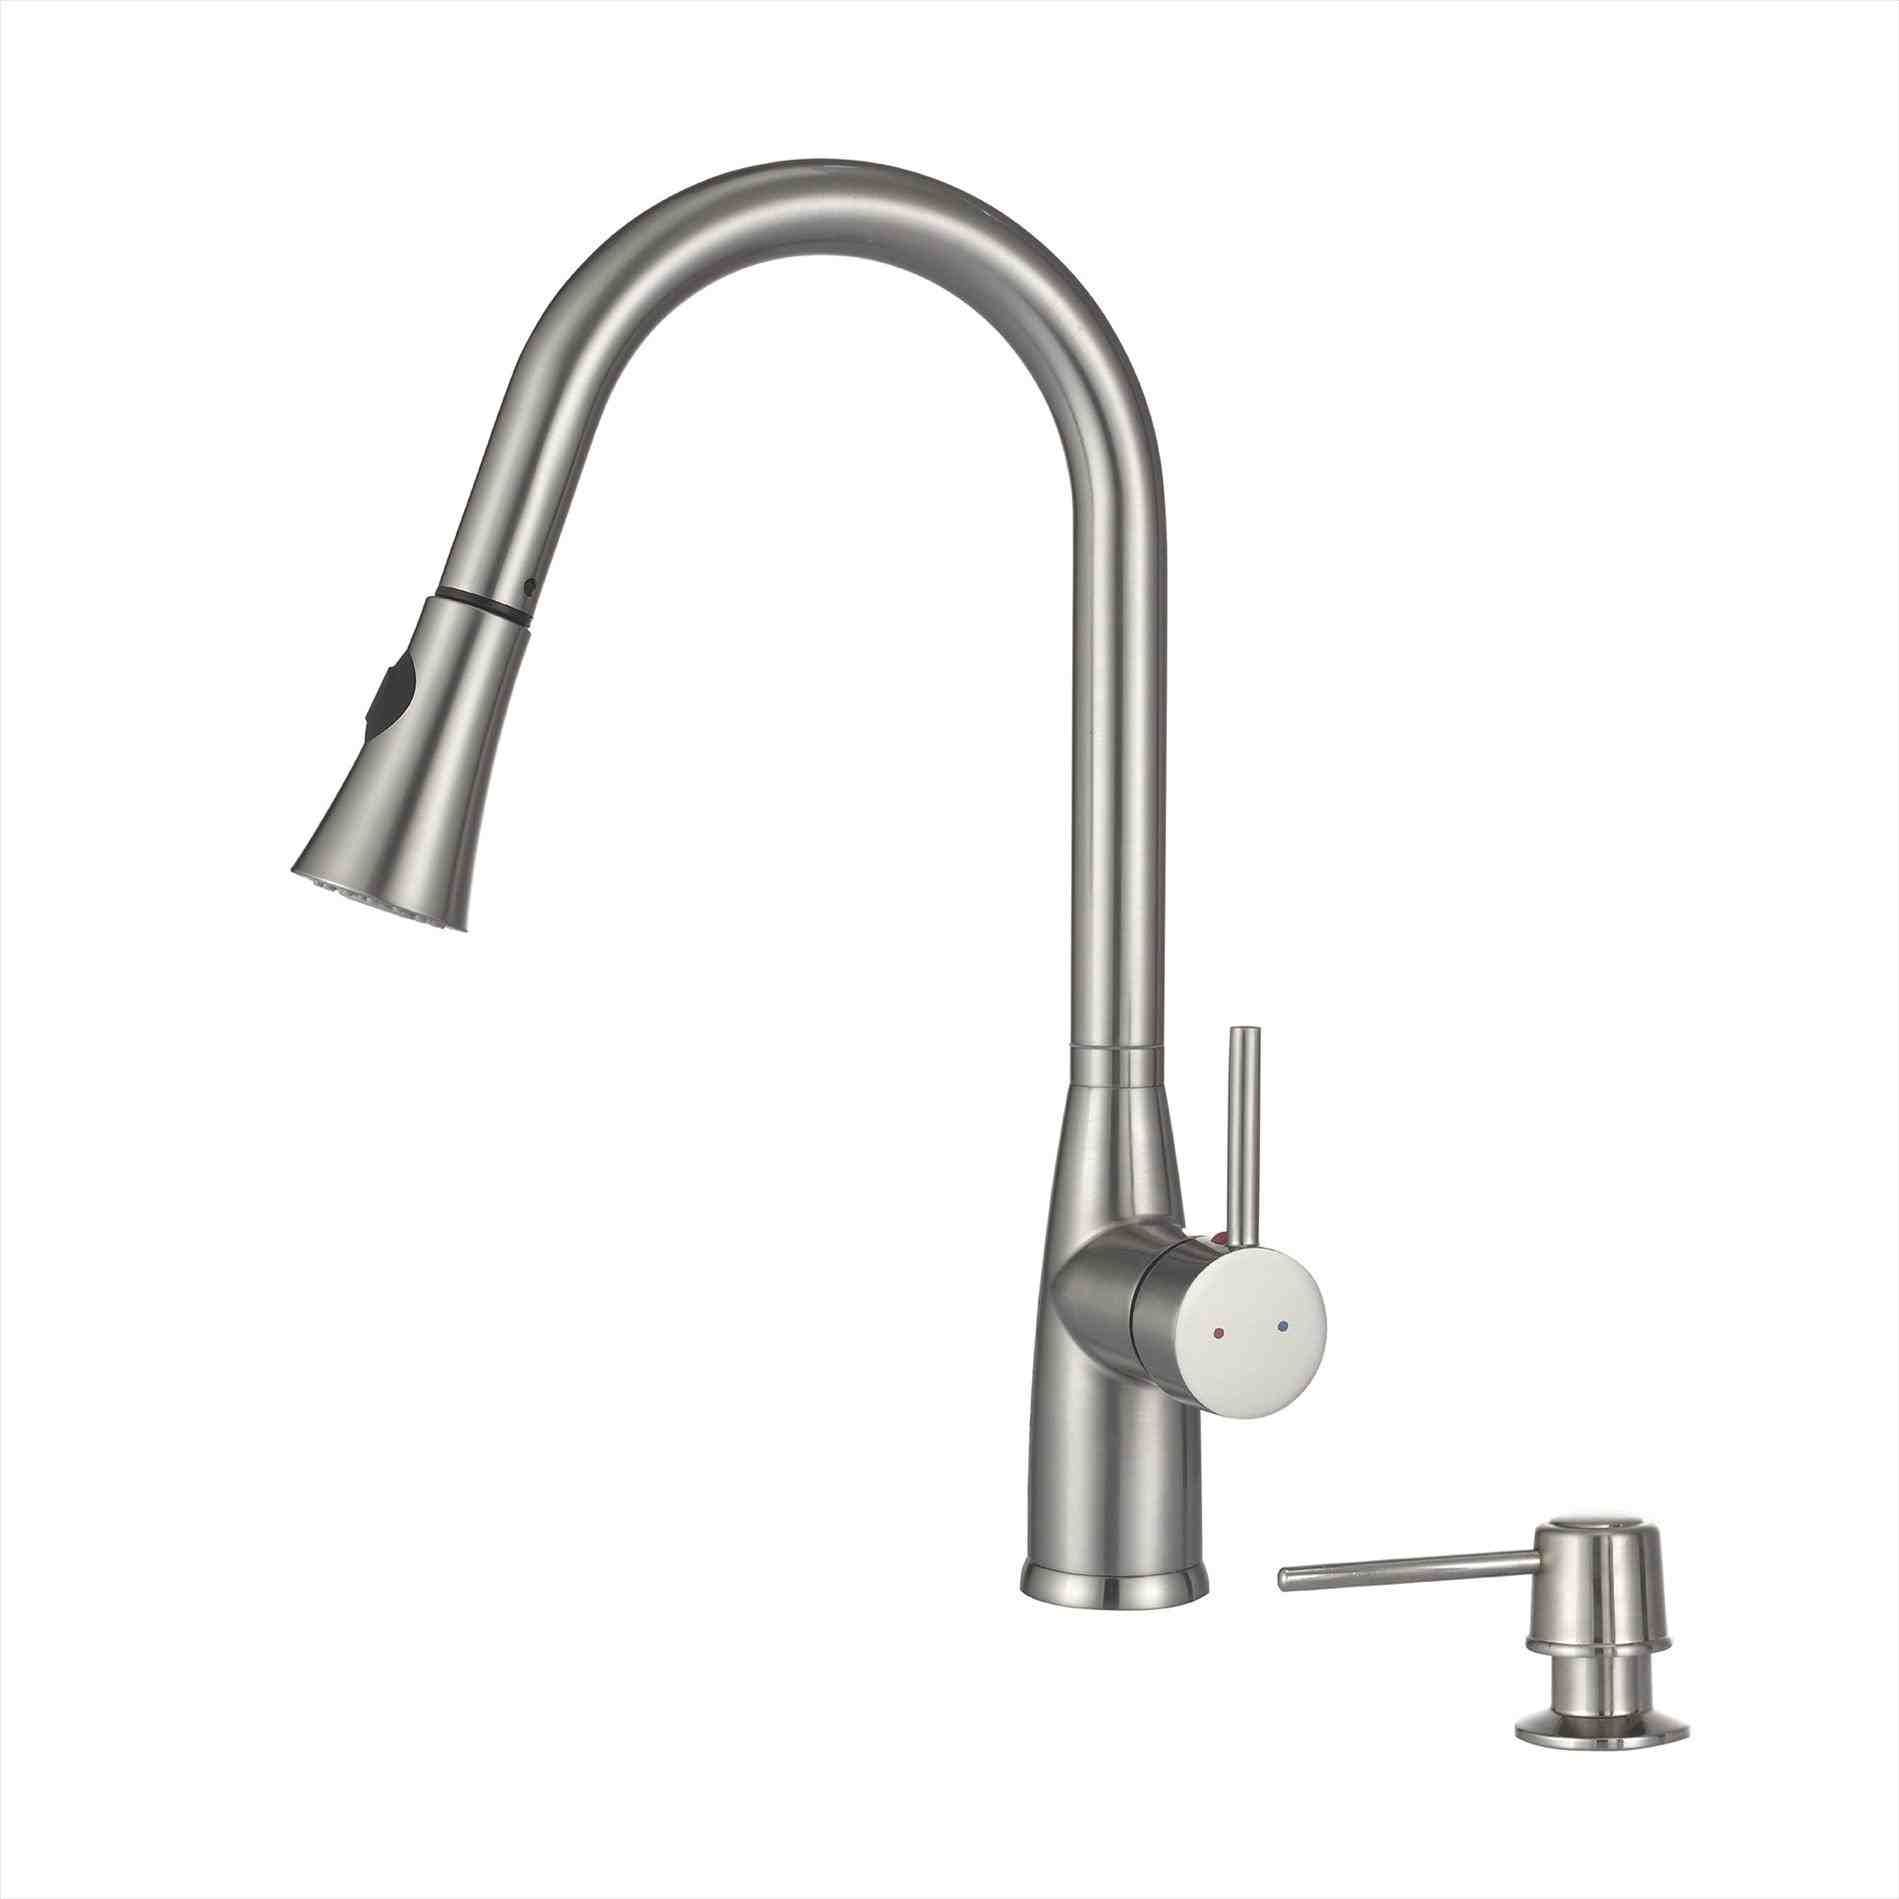 New Post kitchen faucet replacement head visit bathroomremodelideass ...